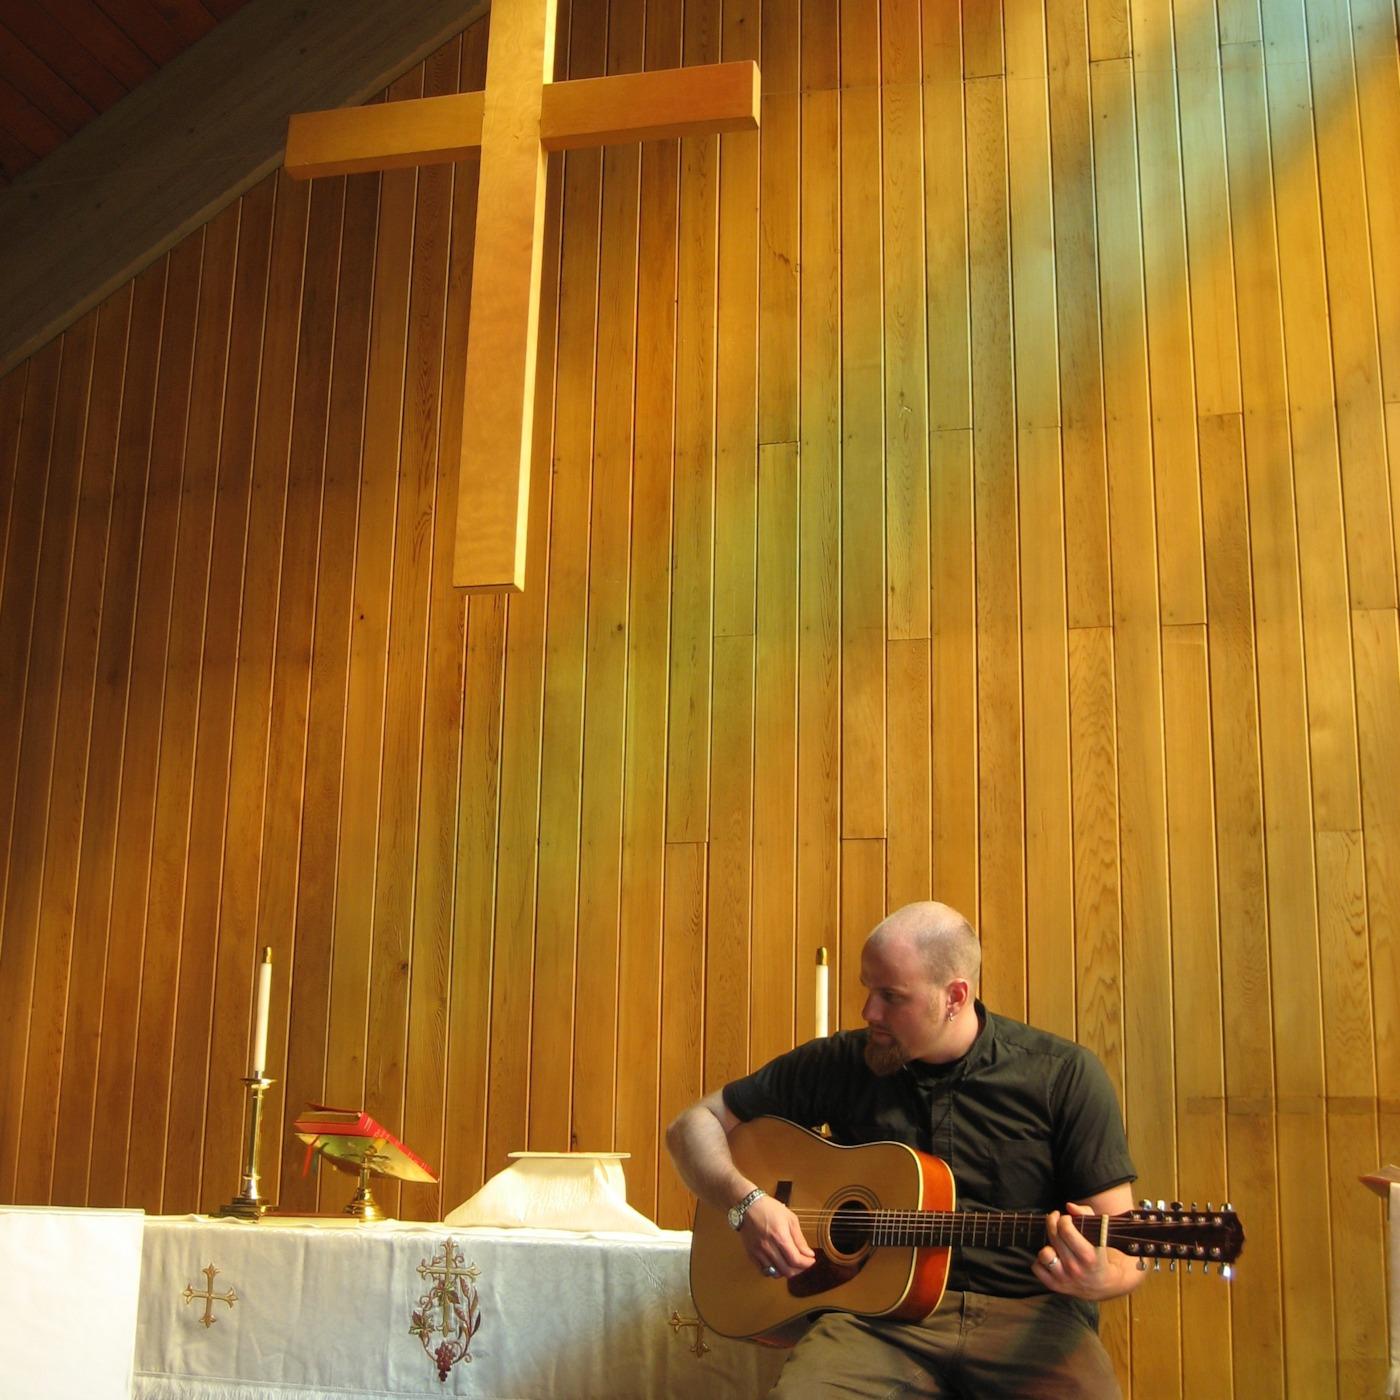 Fr. Paul - Vicar of St. Nick's